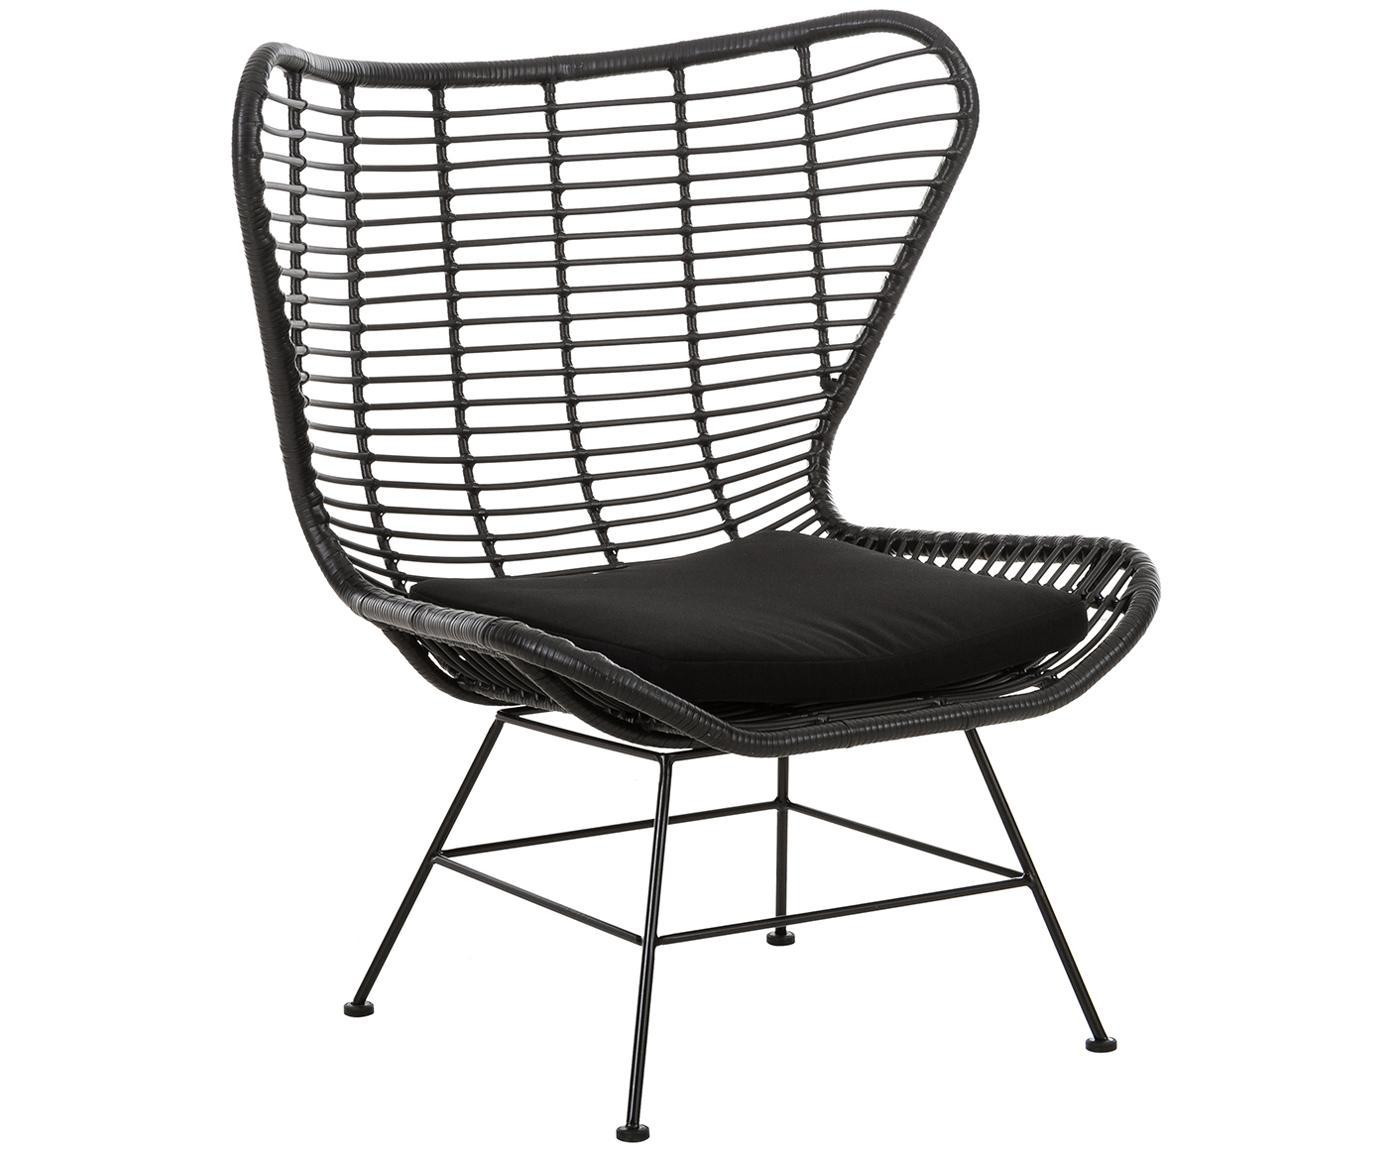 Garten-Loungesessel Costa mit Polyrattan, Sitzfläche: Polyethylen-Geflecht, Gestell: Metall, pulverbeschichtet, Schwarz, B 90 x T 89 cm